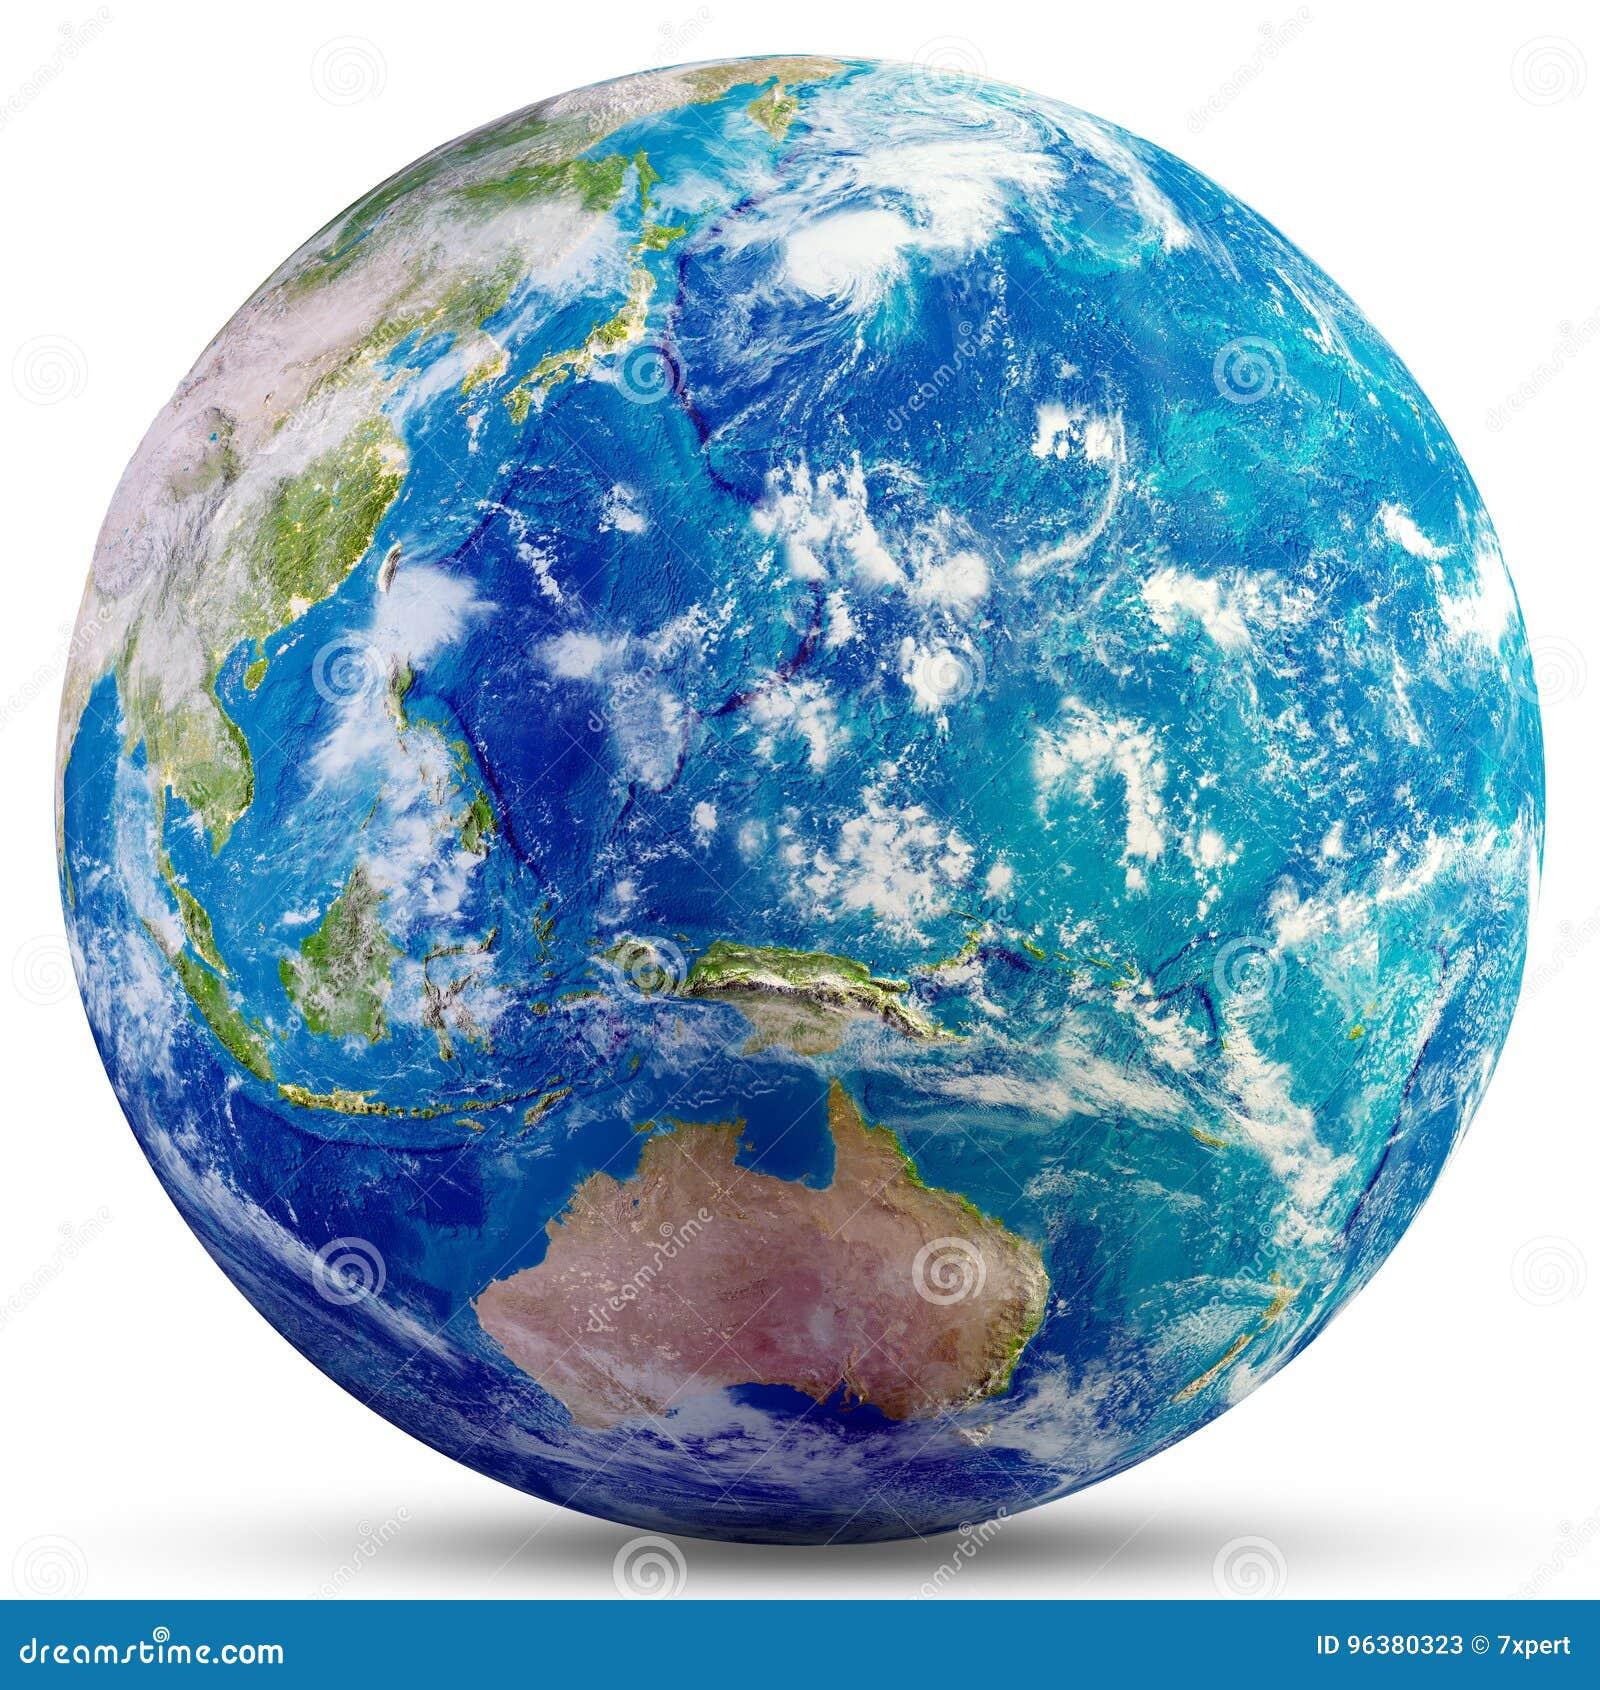 Planet Earth - Australia and Oceania